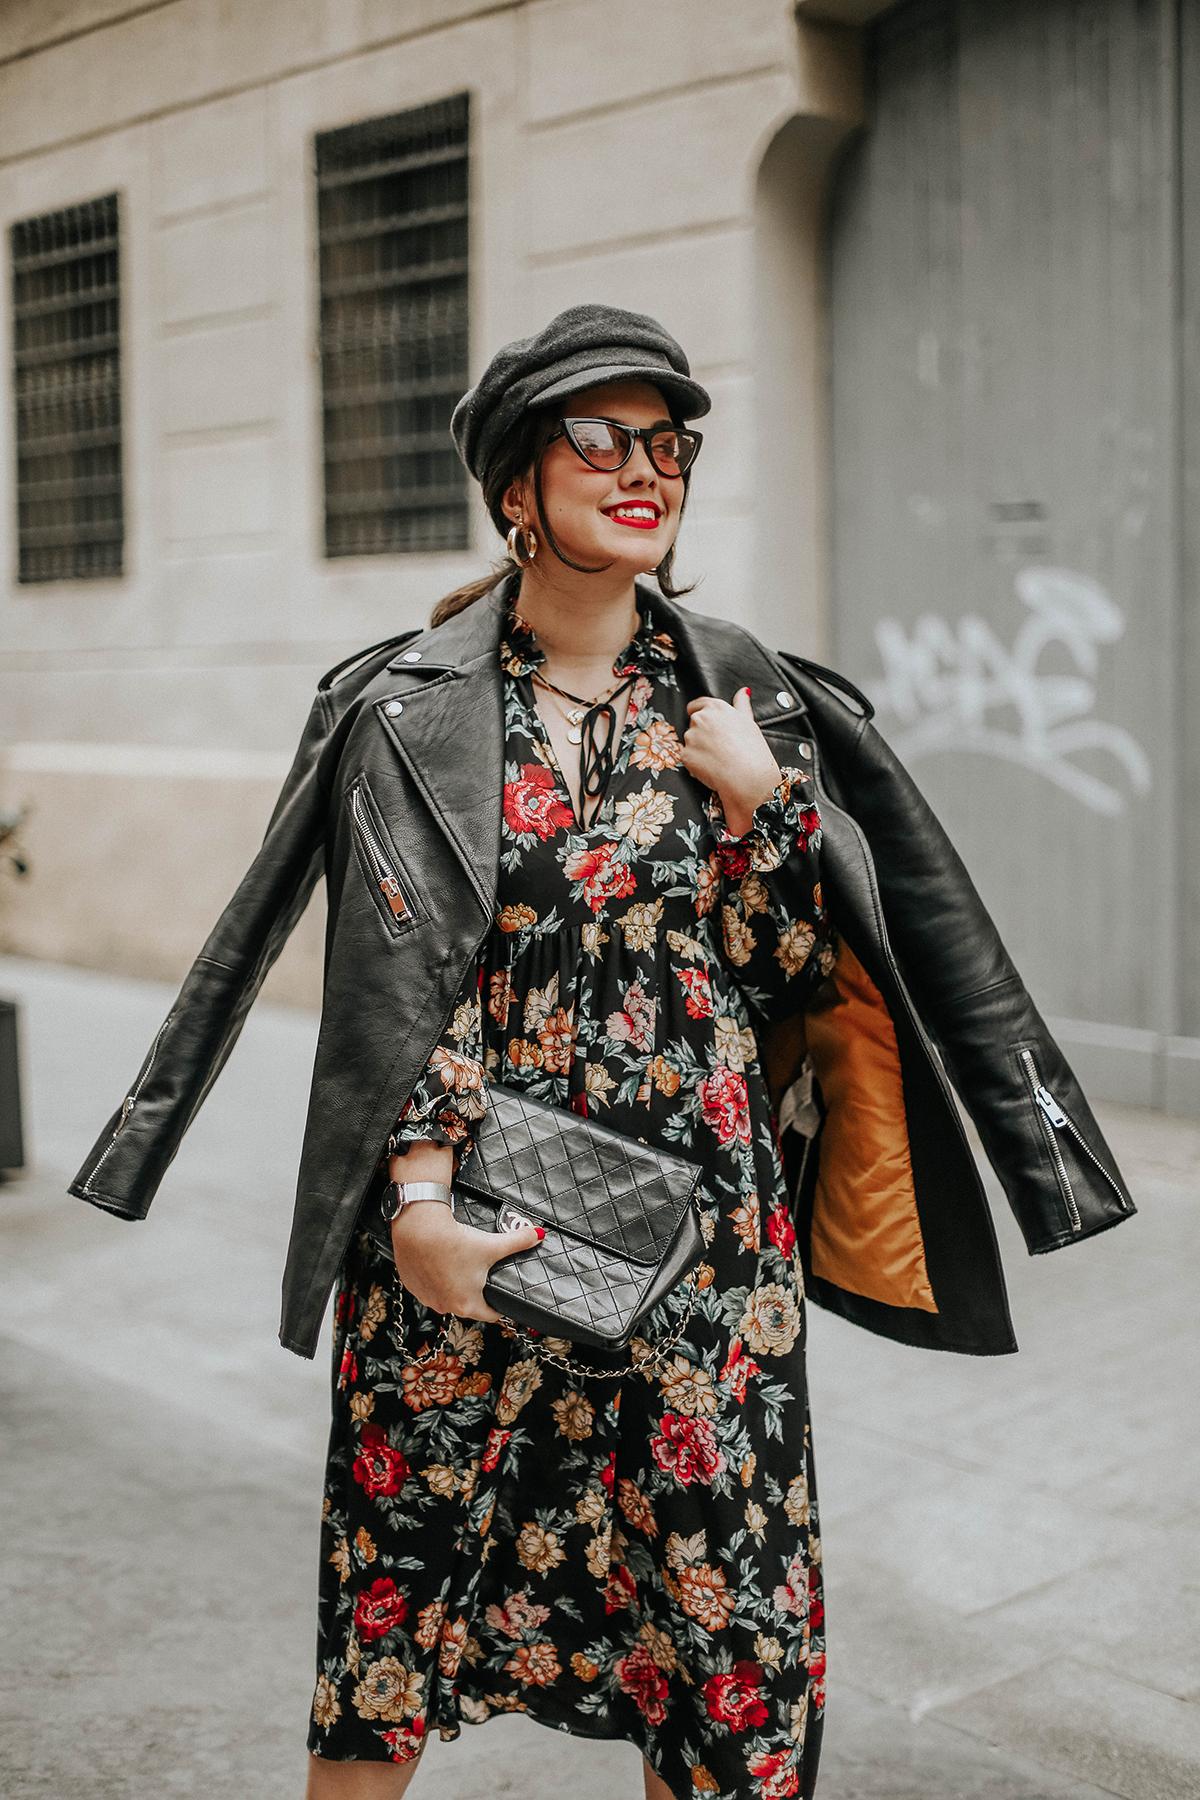 vestido-flores-midi-zara-botines-amazon-find-streetstyle15